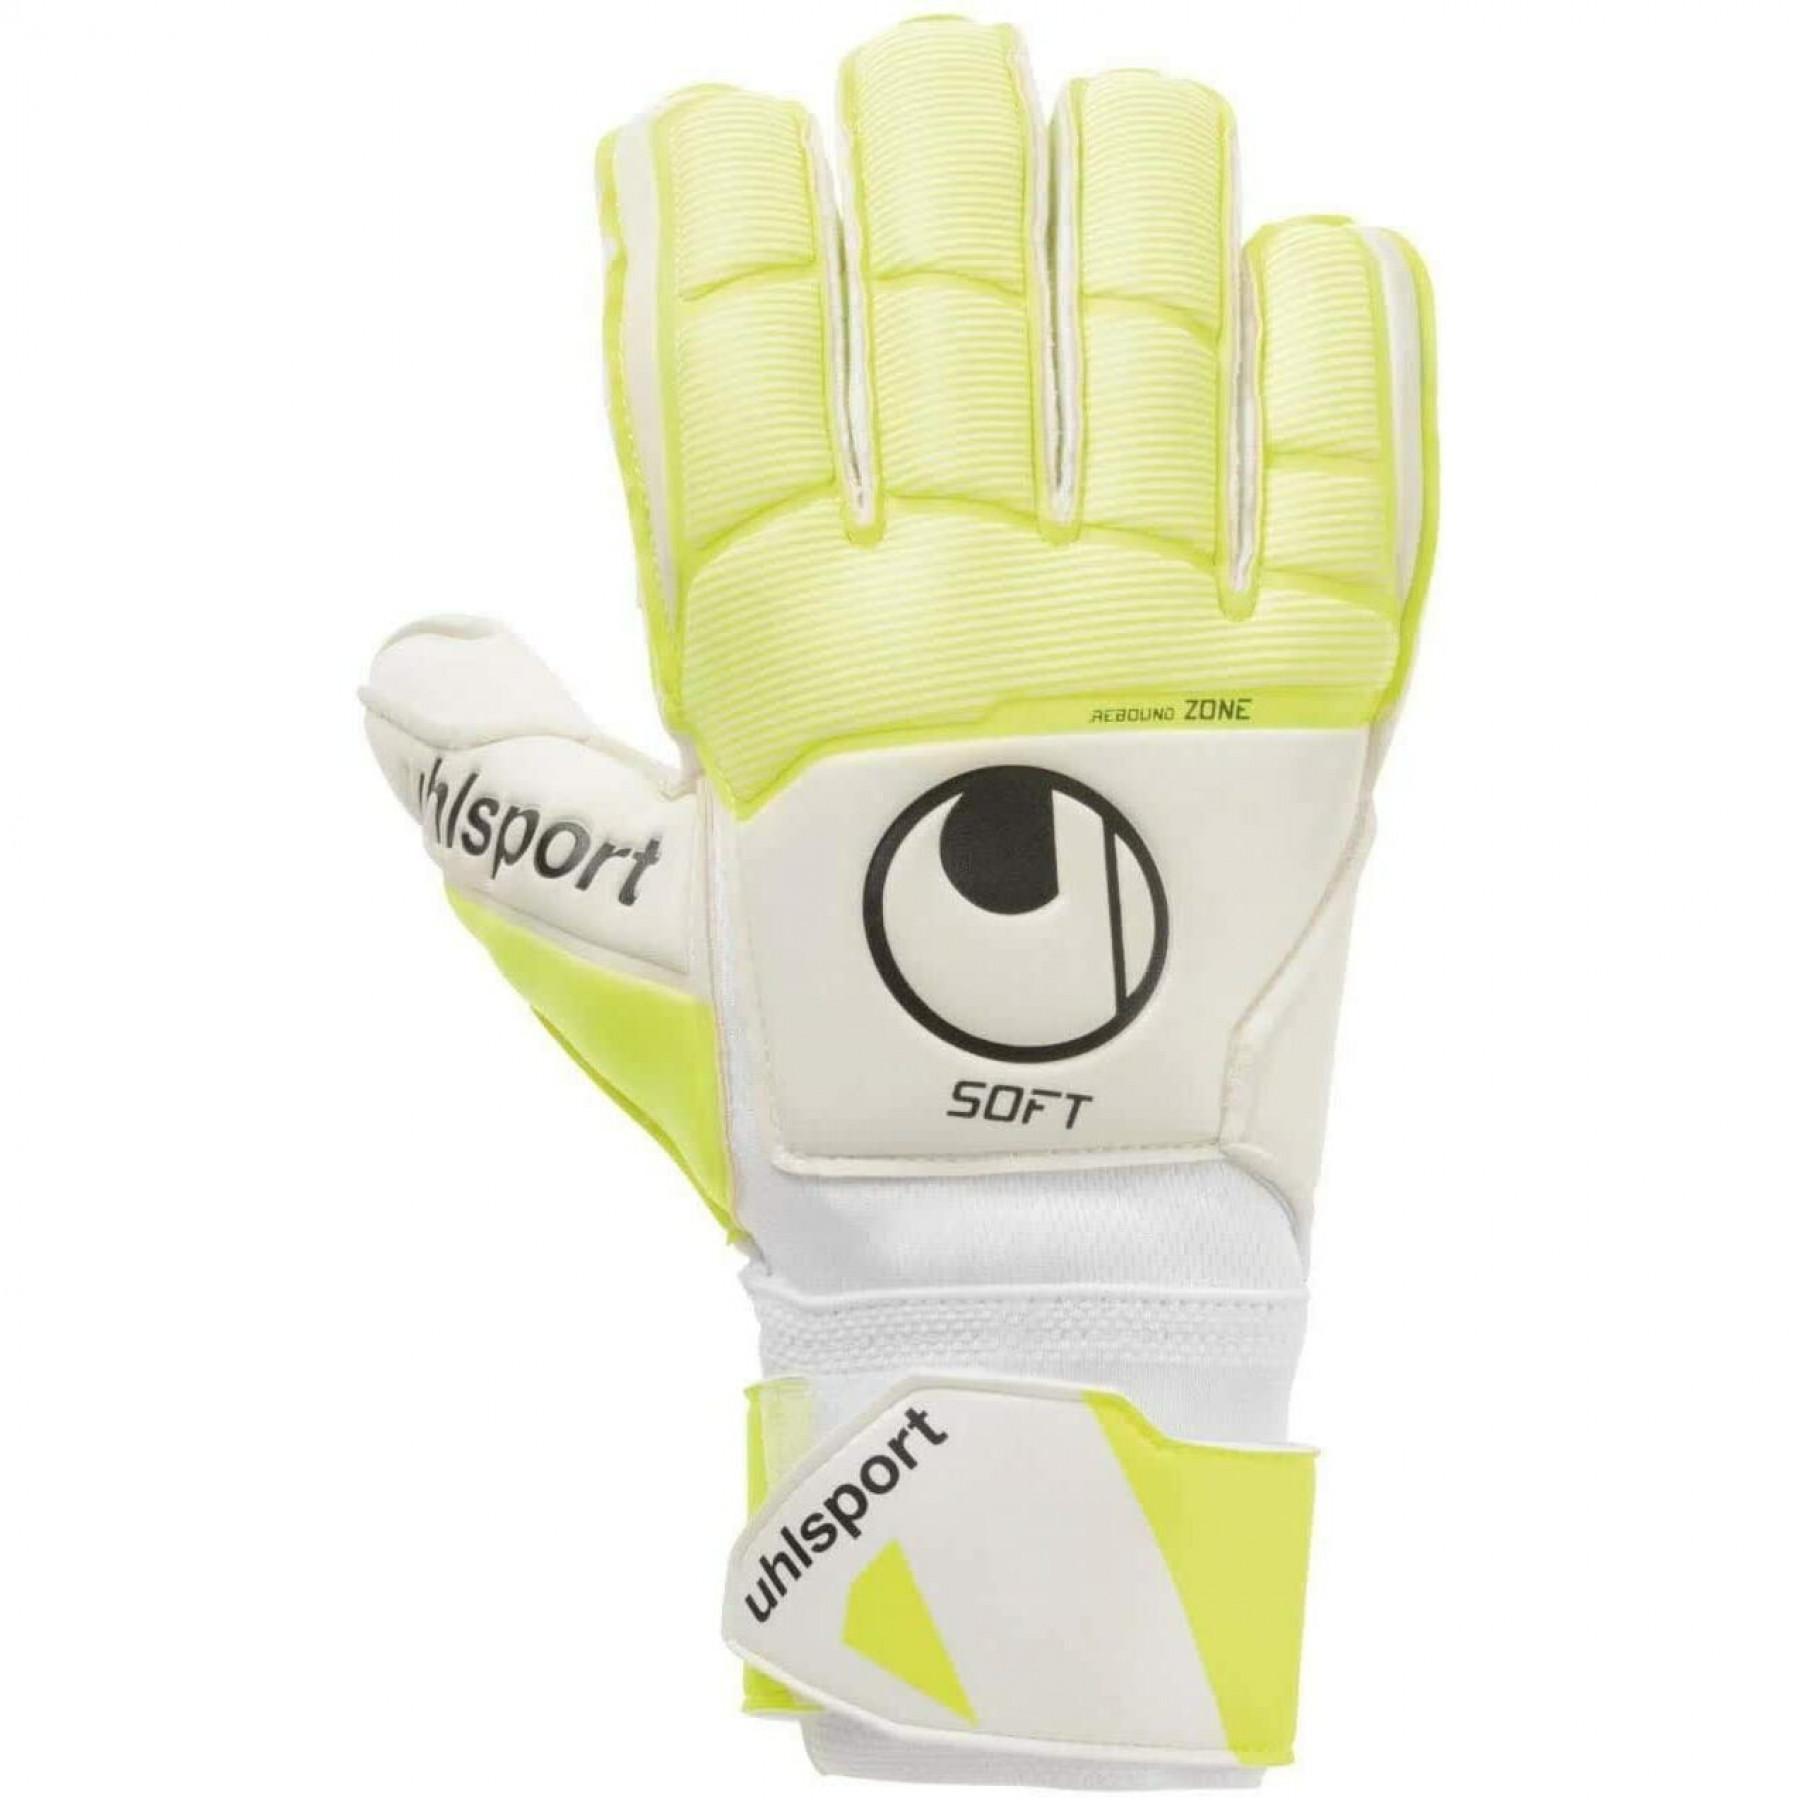 Uhlsport Pure Alliance Zachte Flex Frame Handschoenen